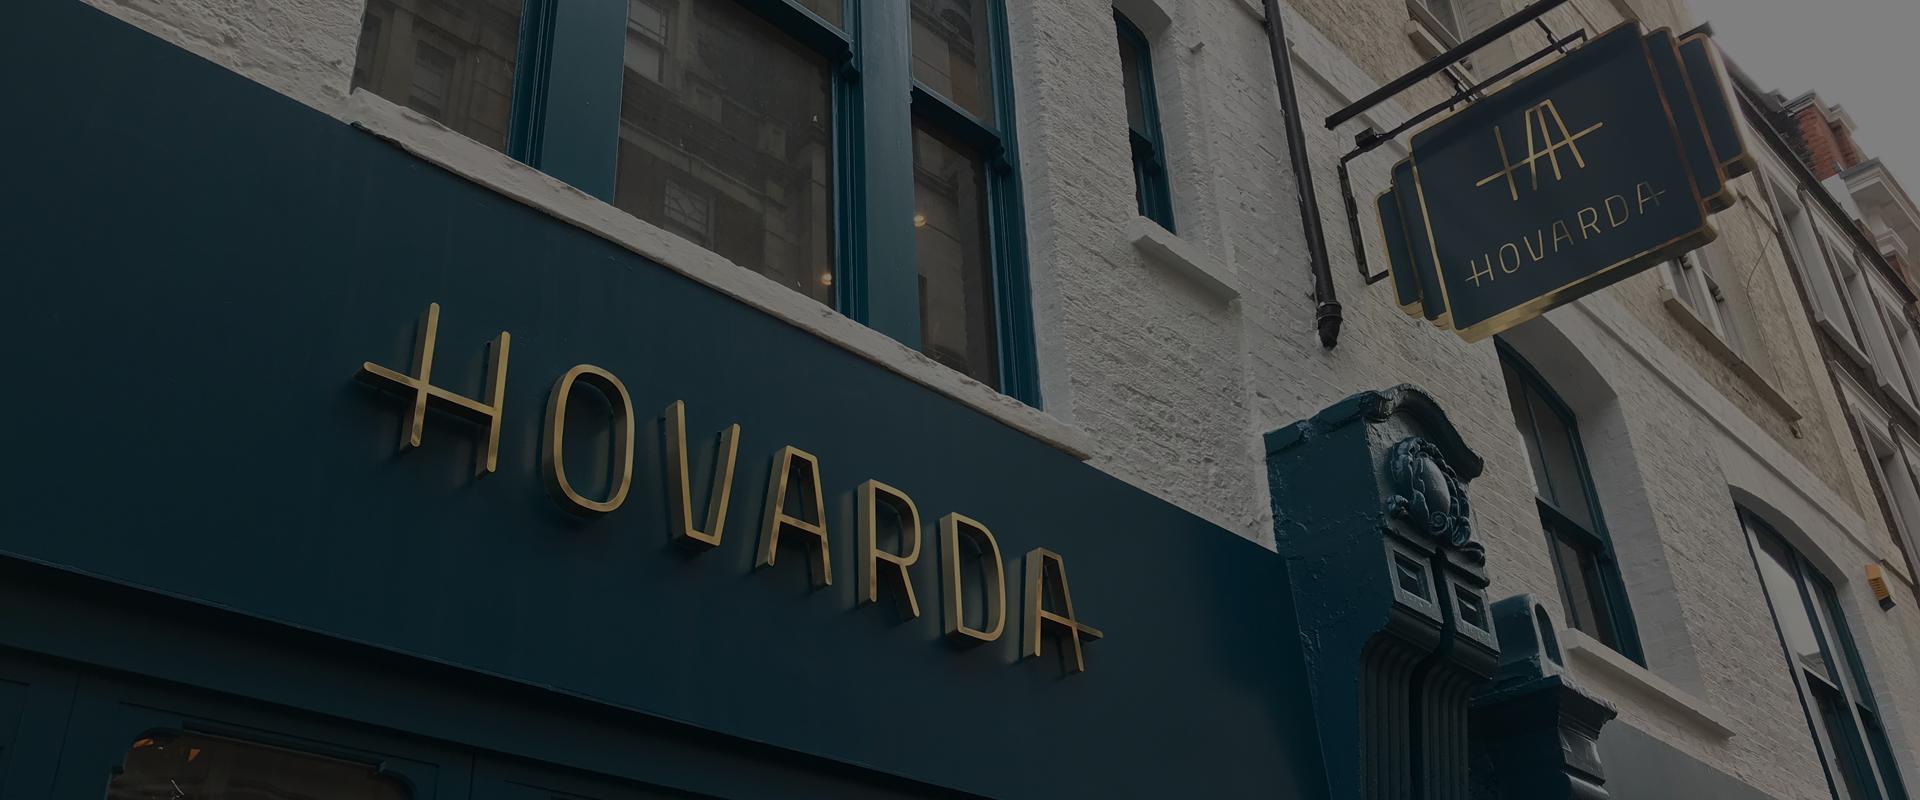 hovarda external signage